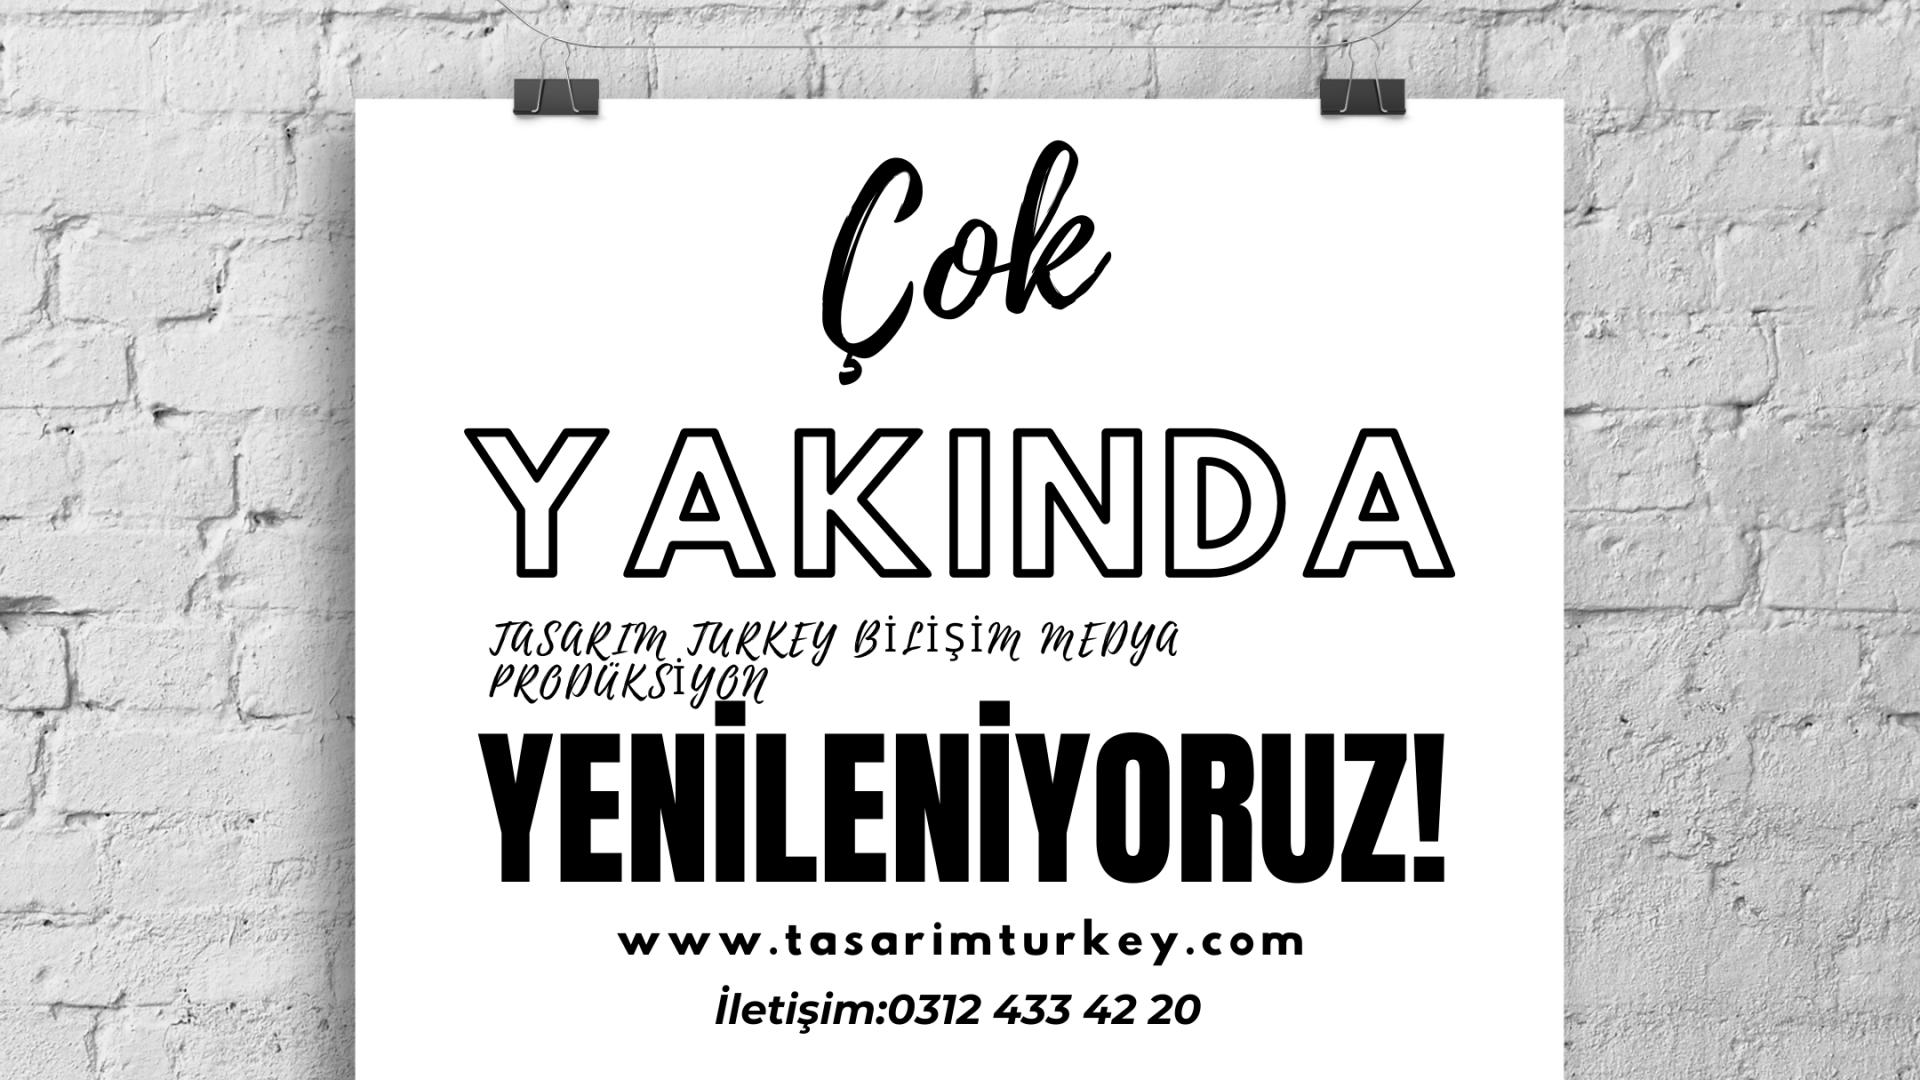 Tasarım Turkey